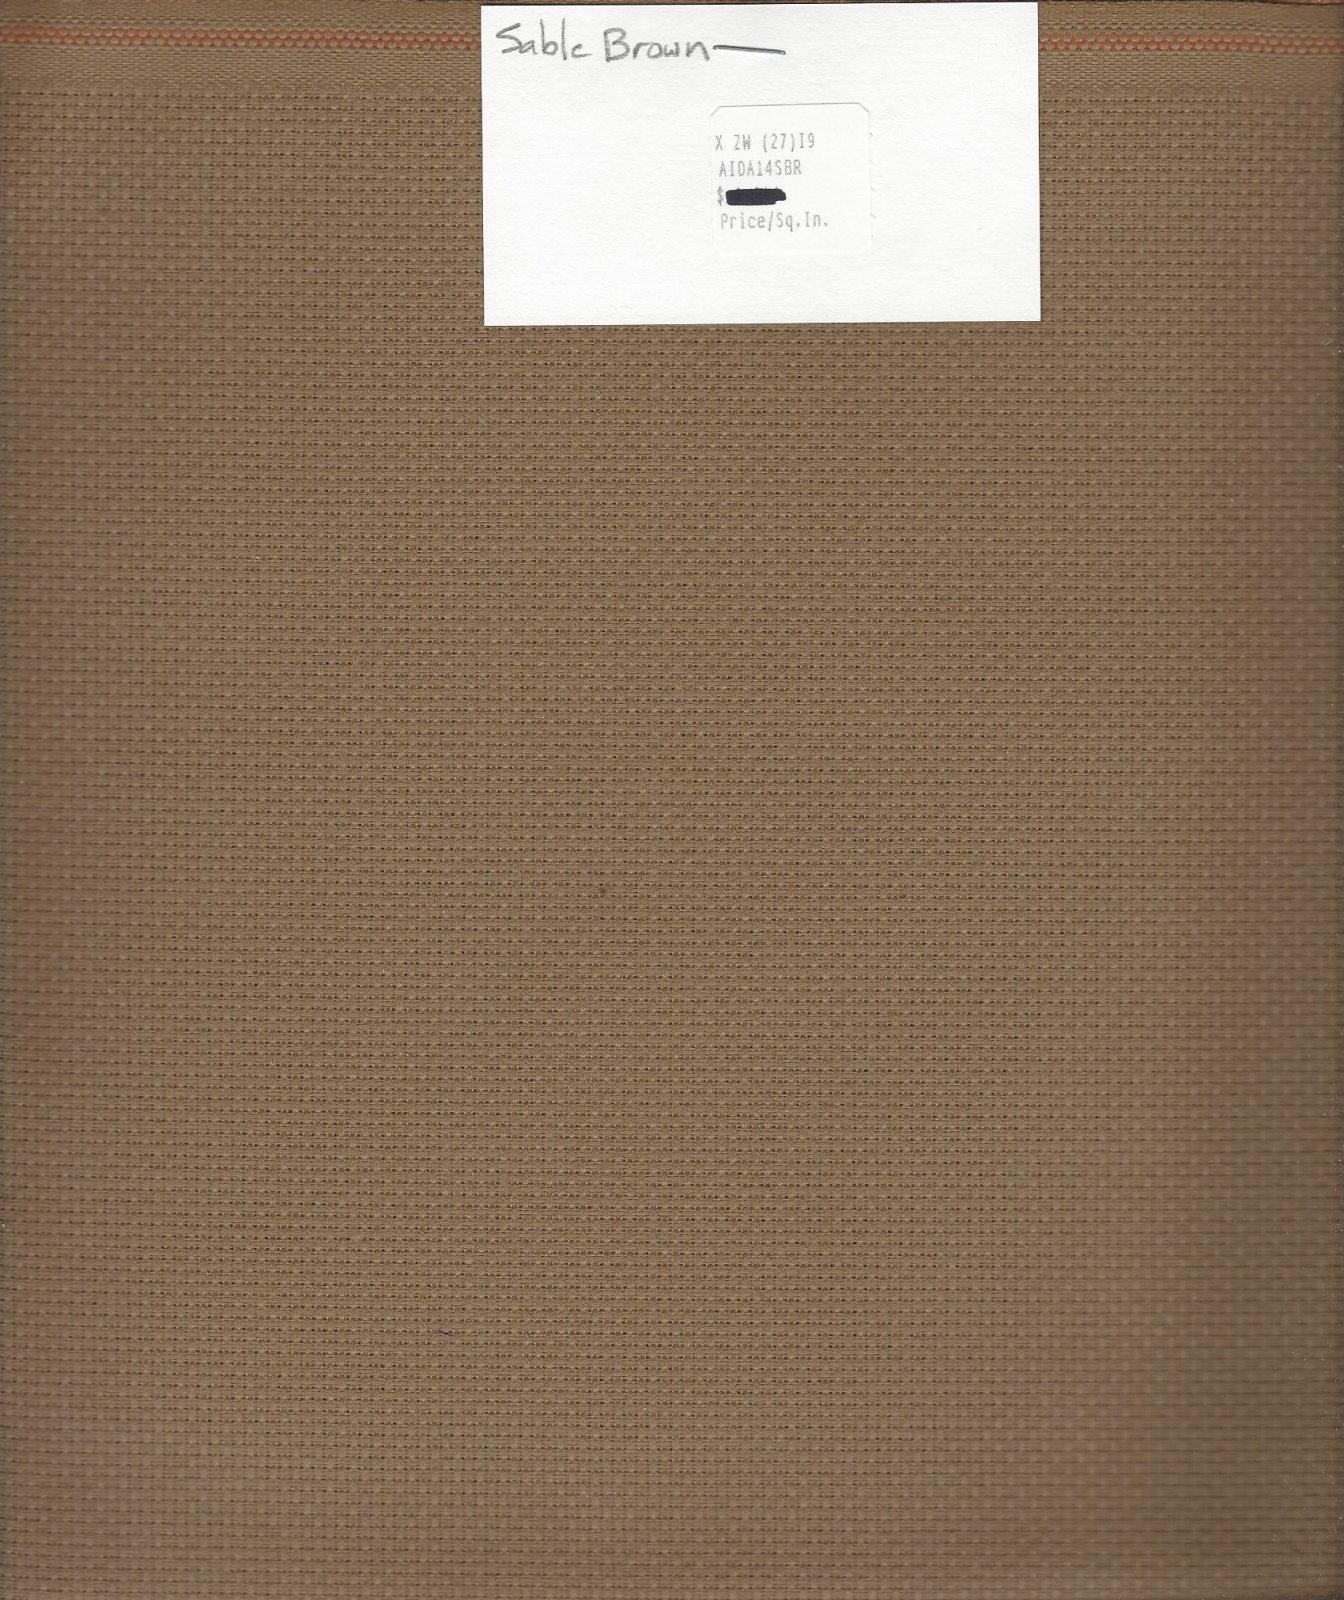 Aida 14ct Sable Brown (discontinued color)